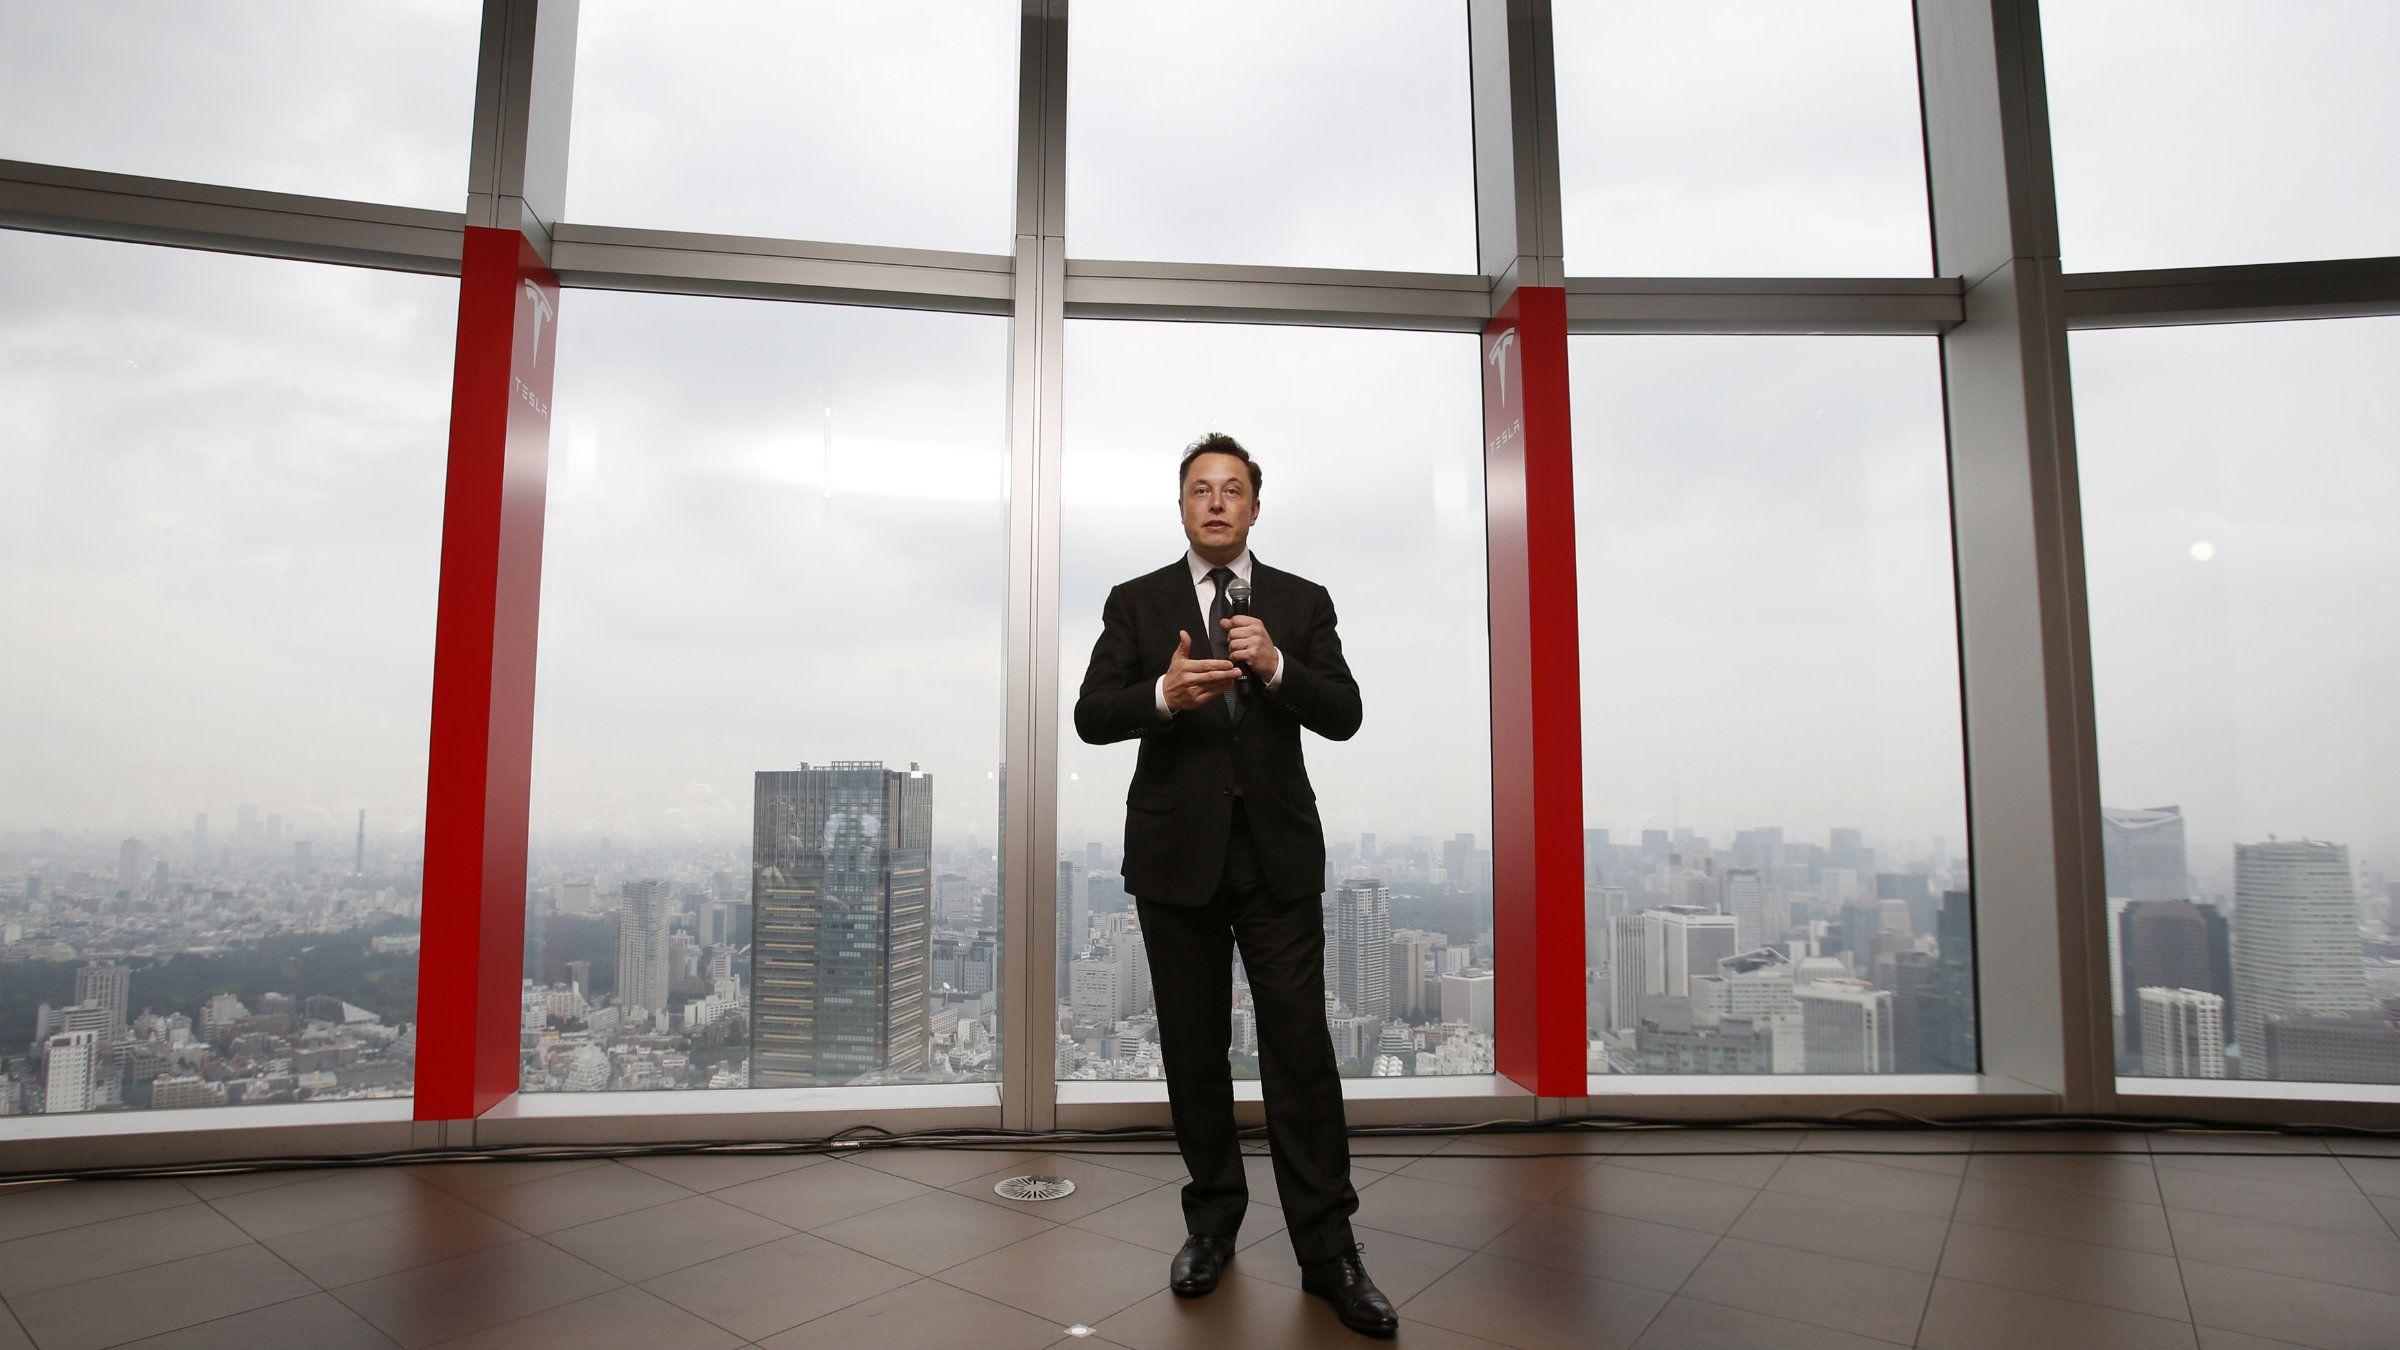 Elon Musk Tesla Apple Steve Jobs